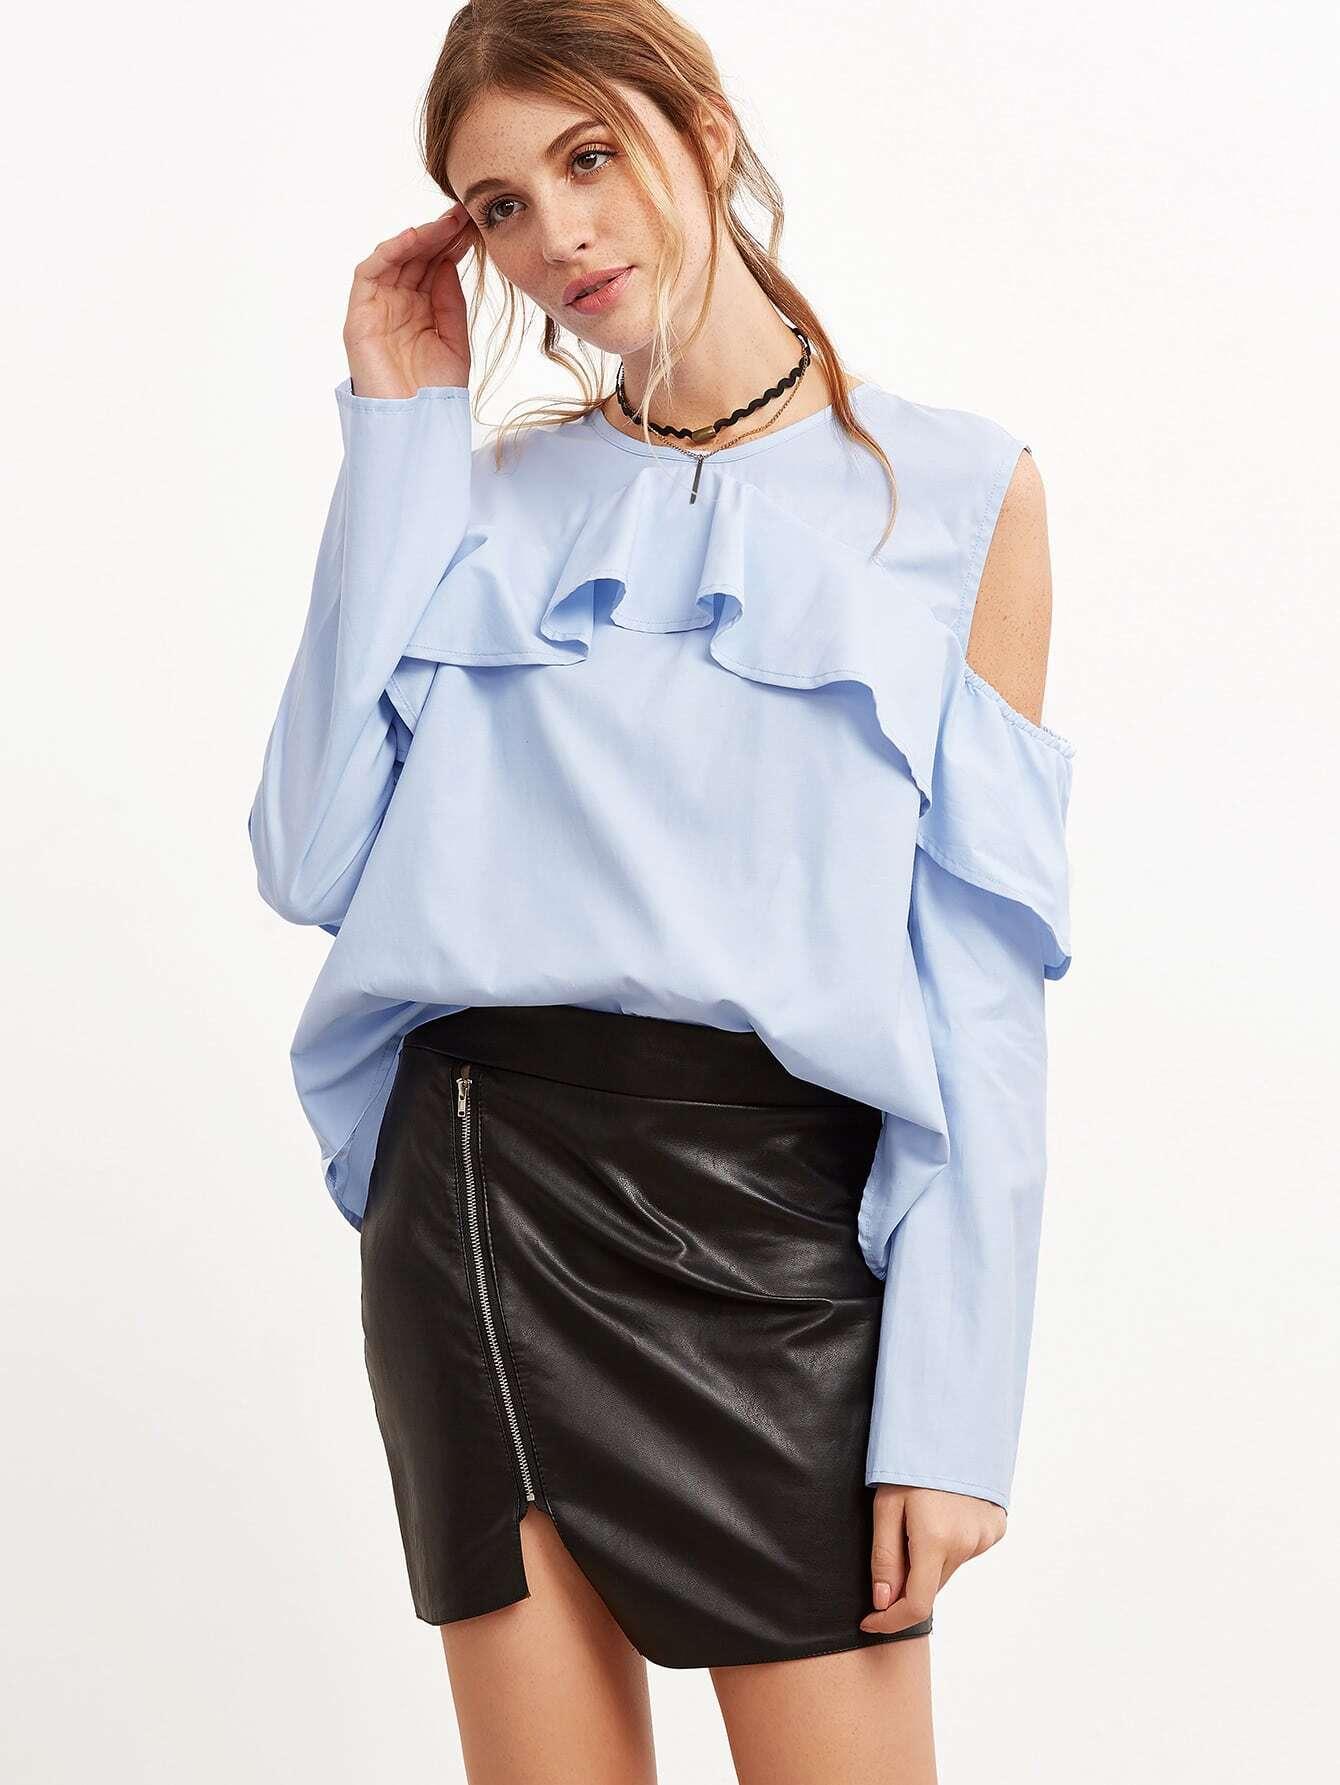 blouse160927703_2